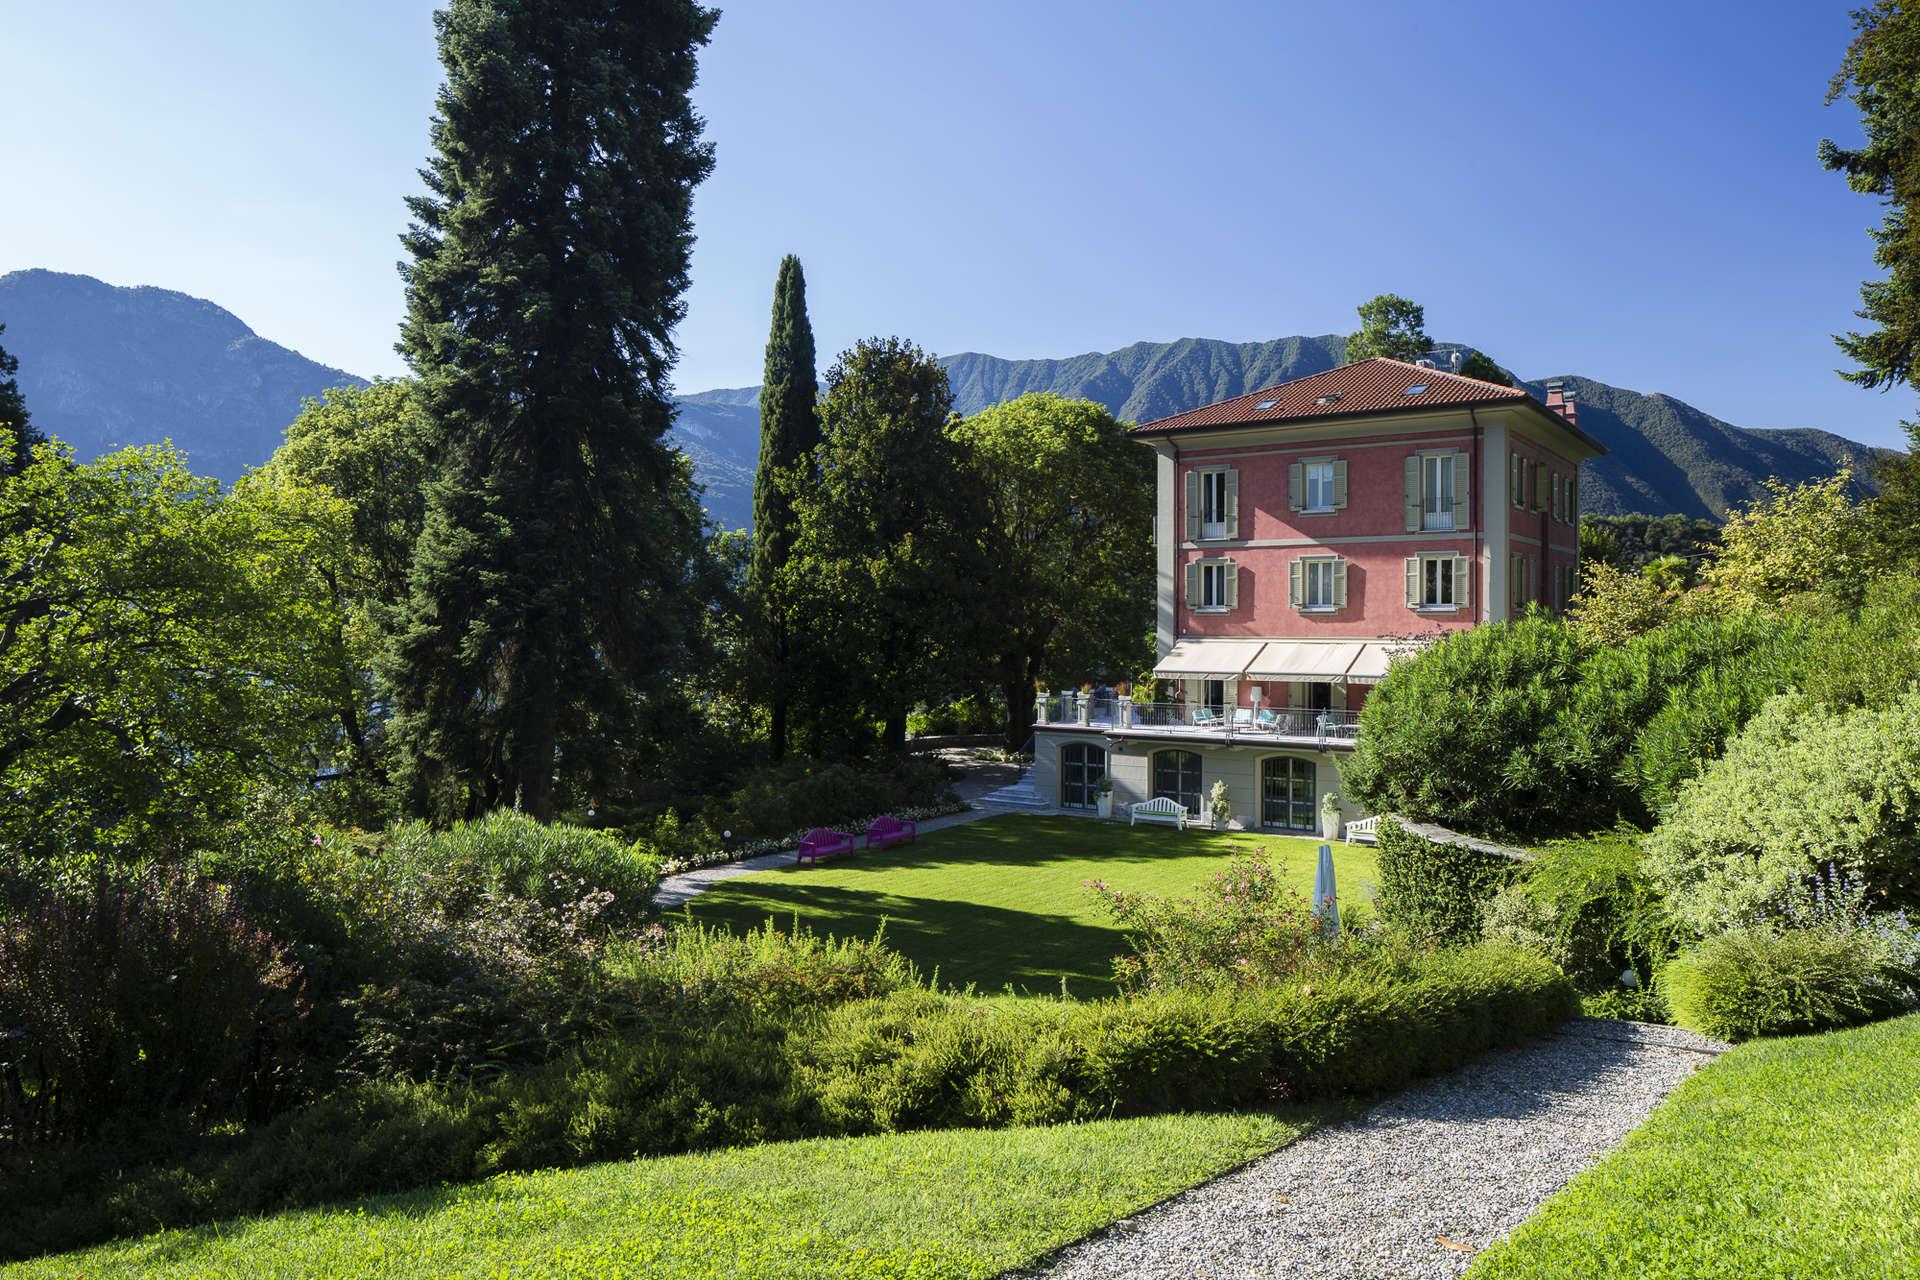 - Villa Porto Felice - Image 1/43